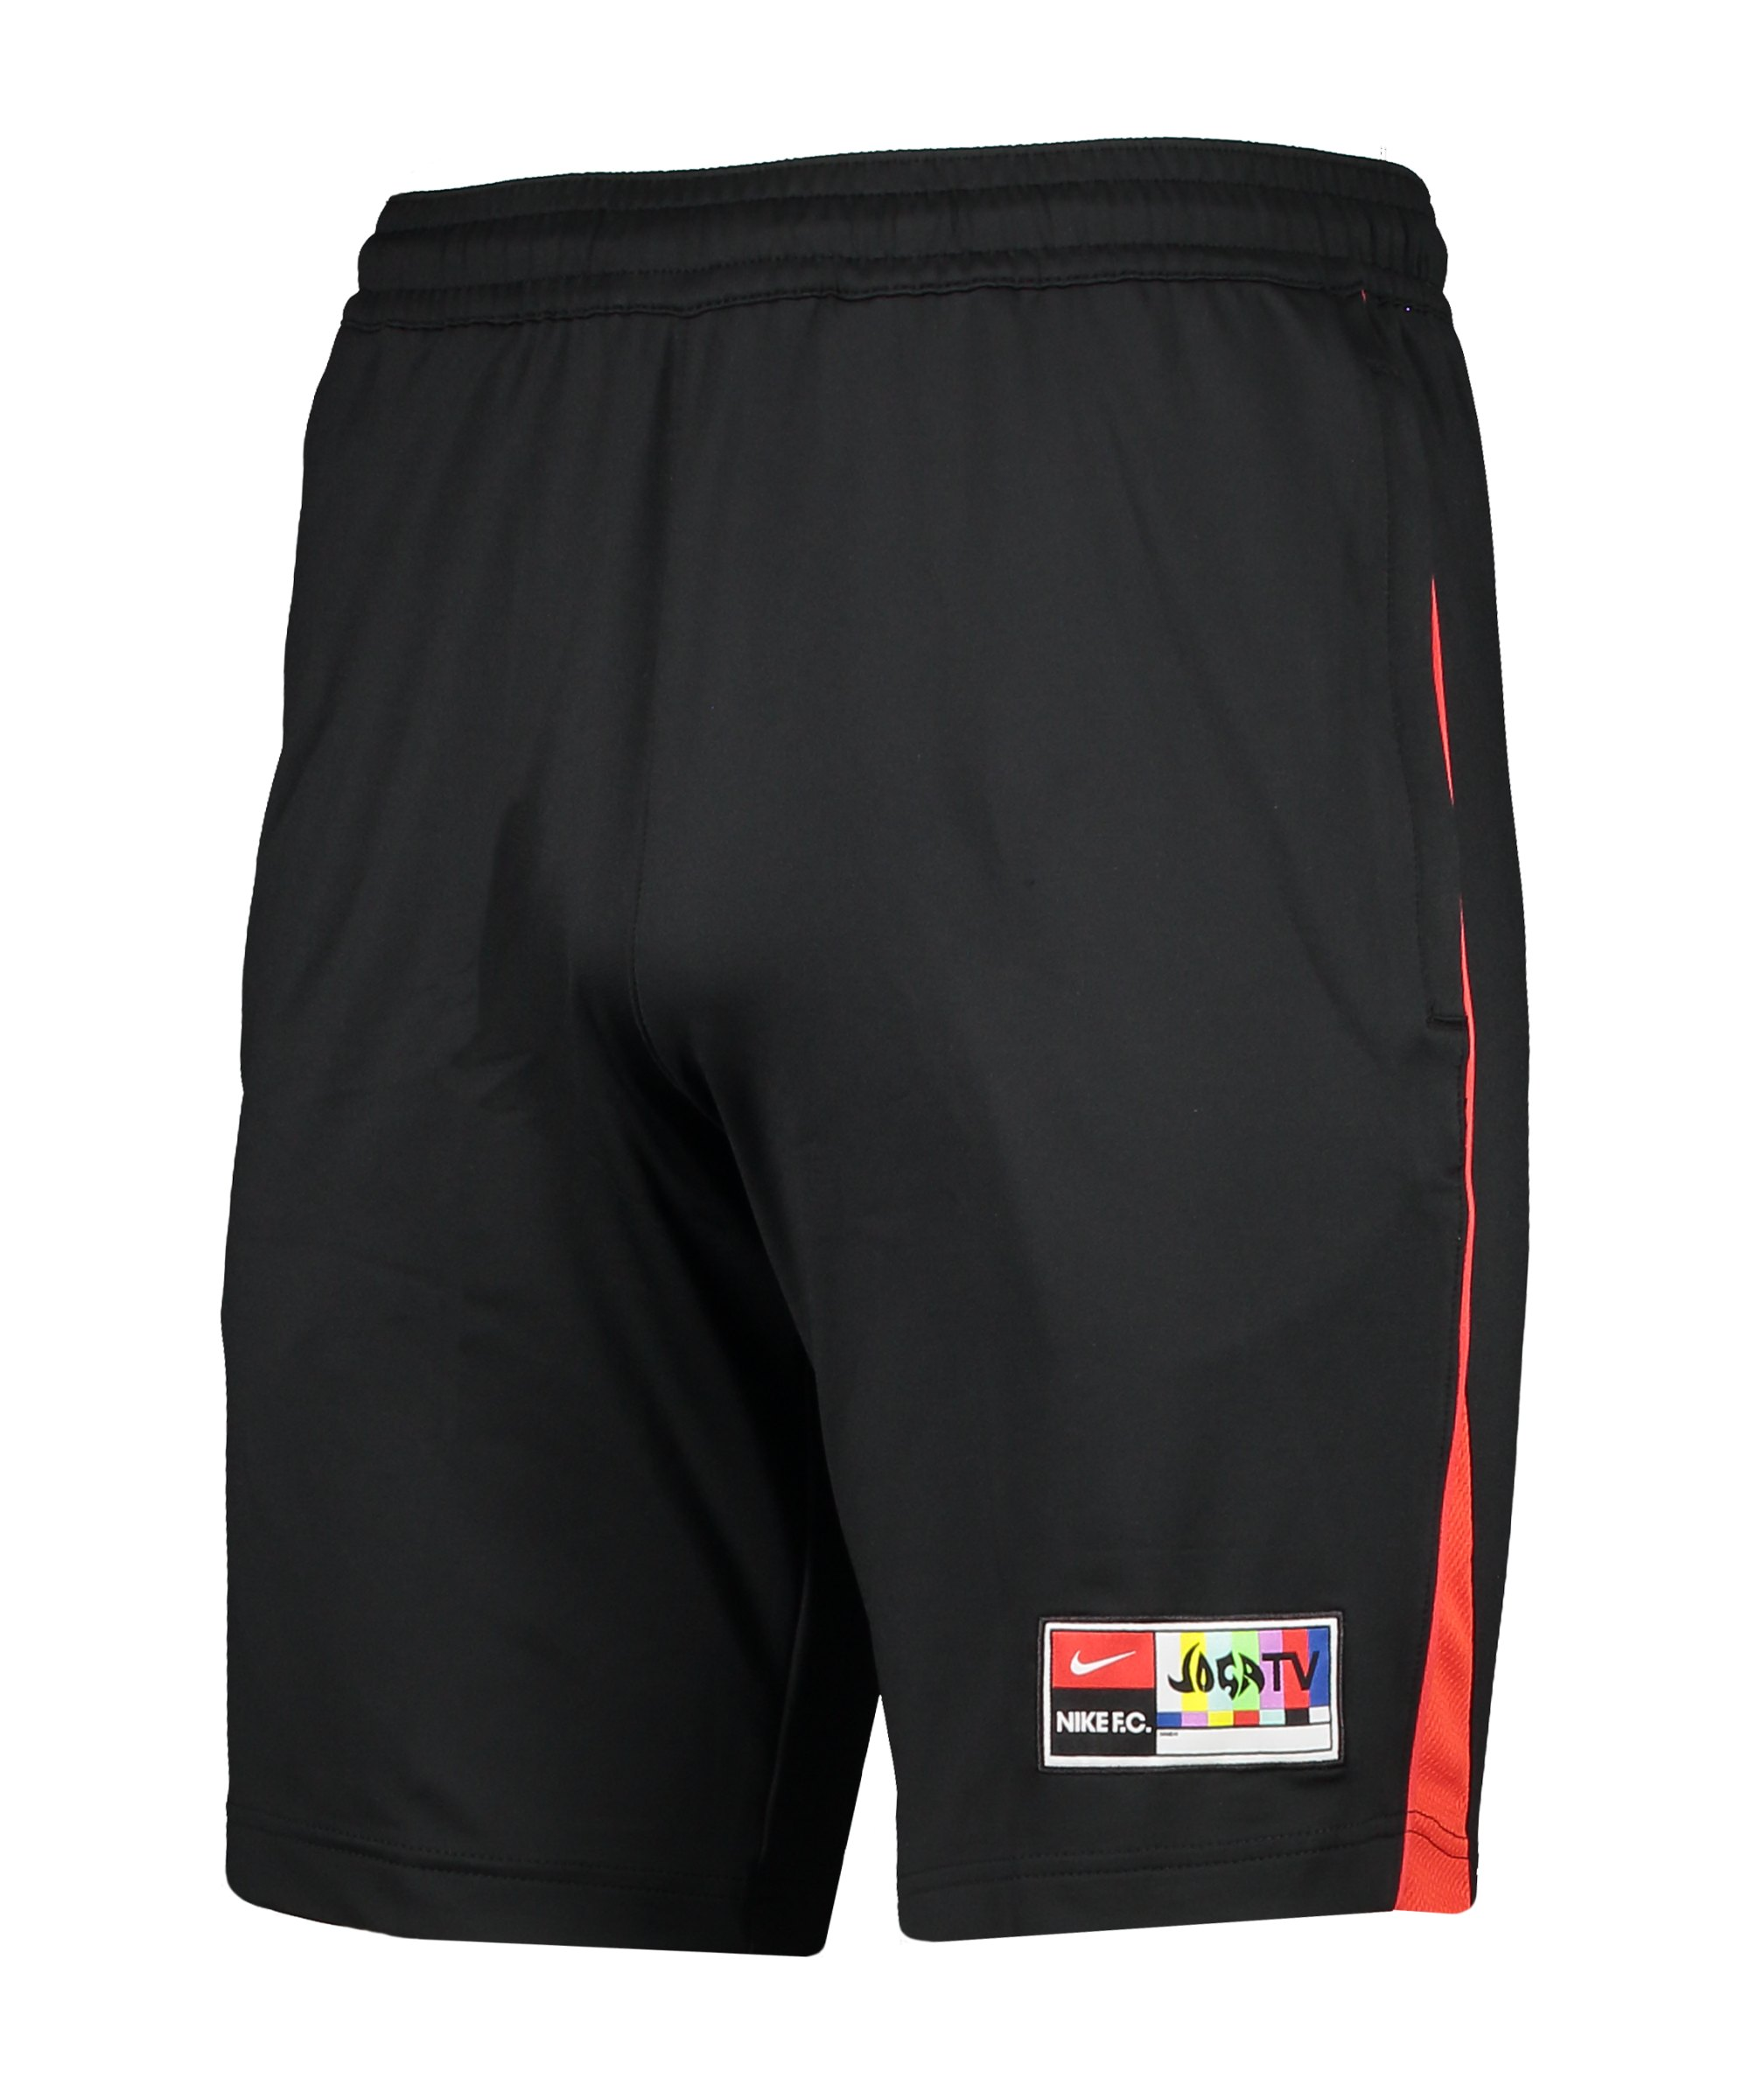 Nike F.C. Joga Bonito Short Schwarz F010 - schwarz